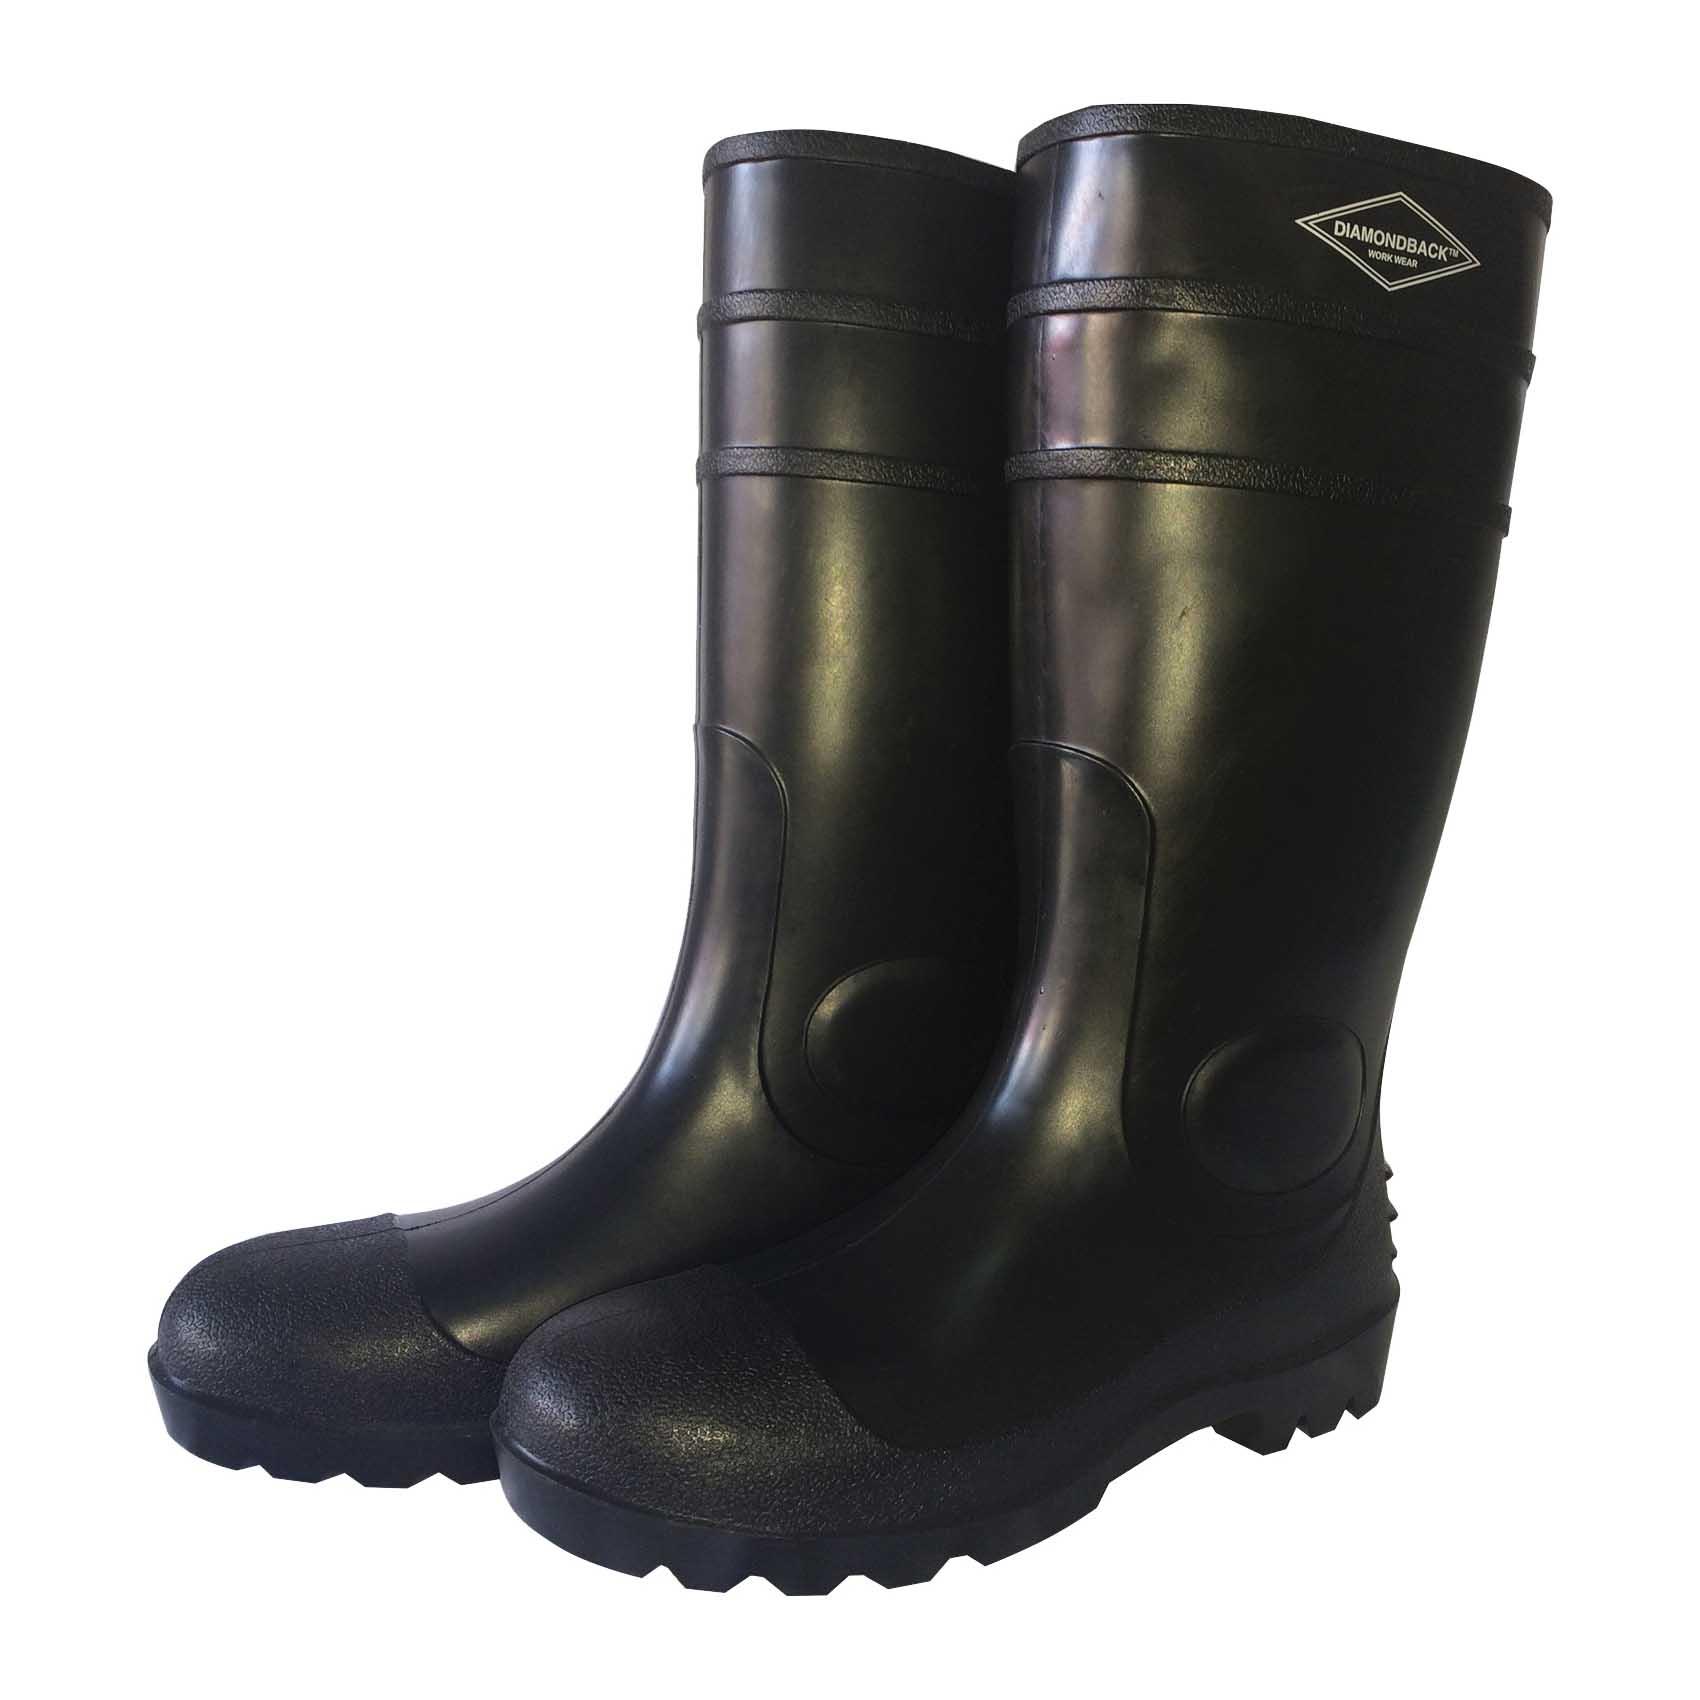 Picture of Diamondback L-G06B-10 Knee Boots, 10, Black, PVC Upper